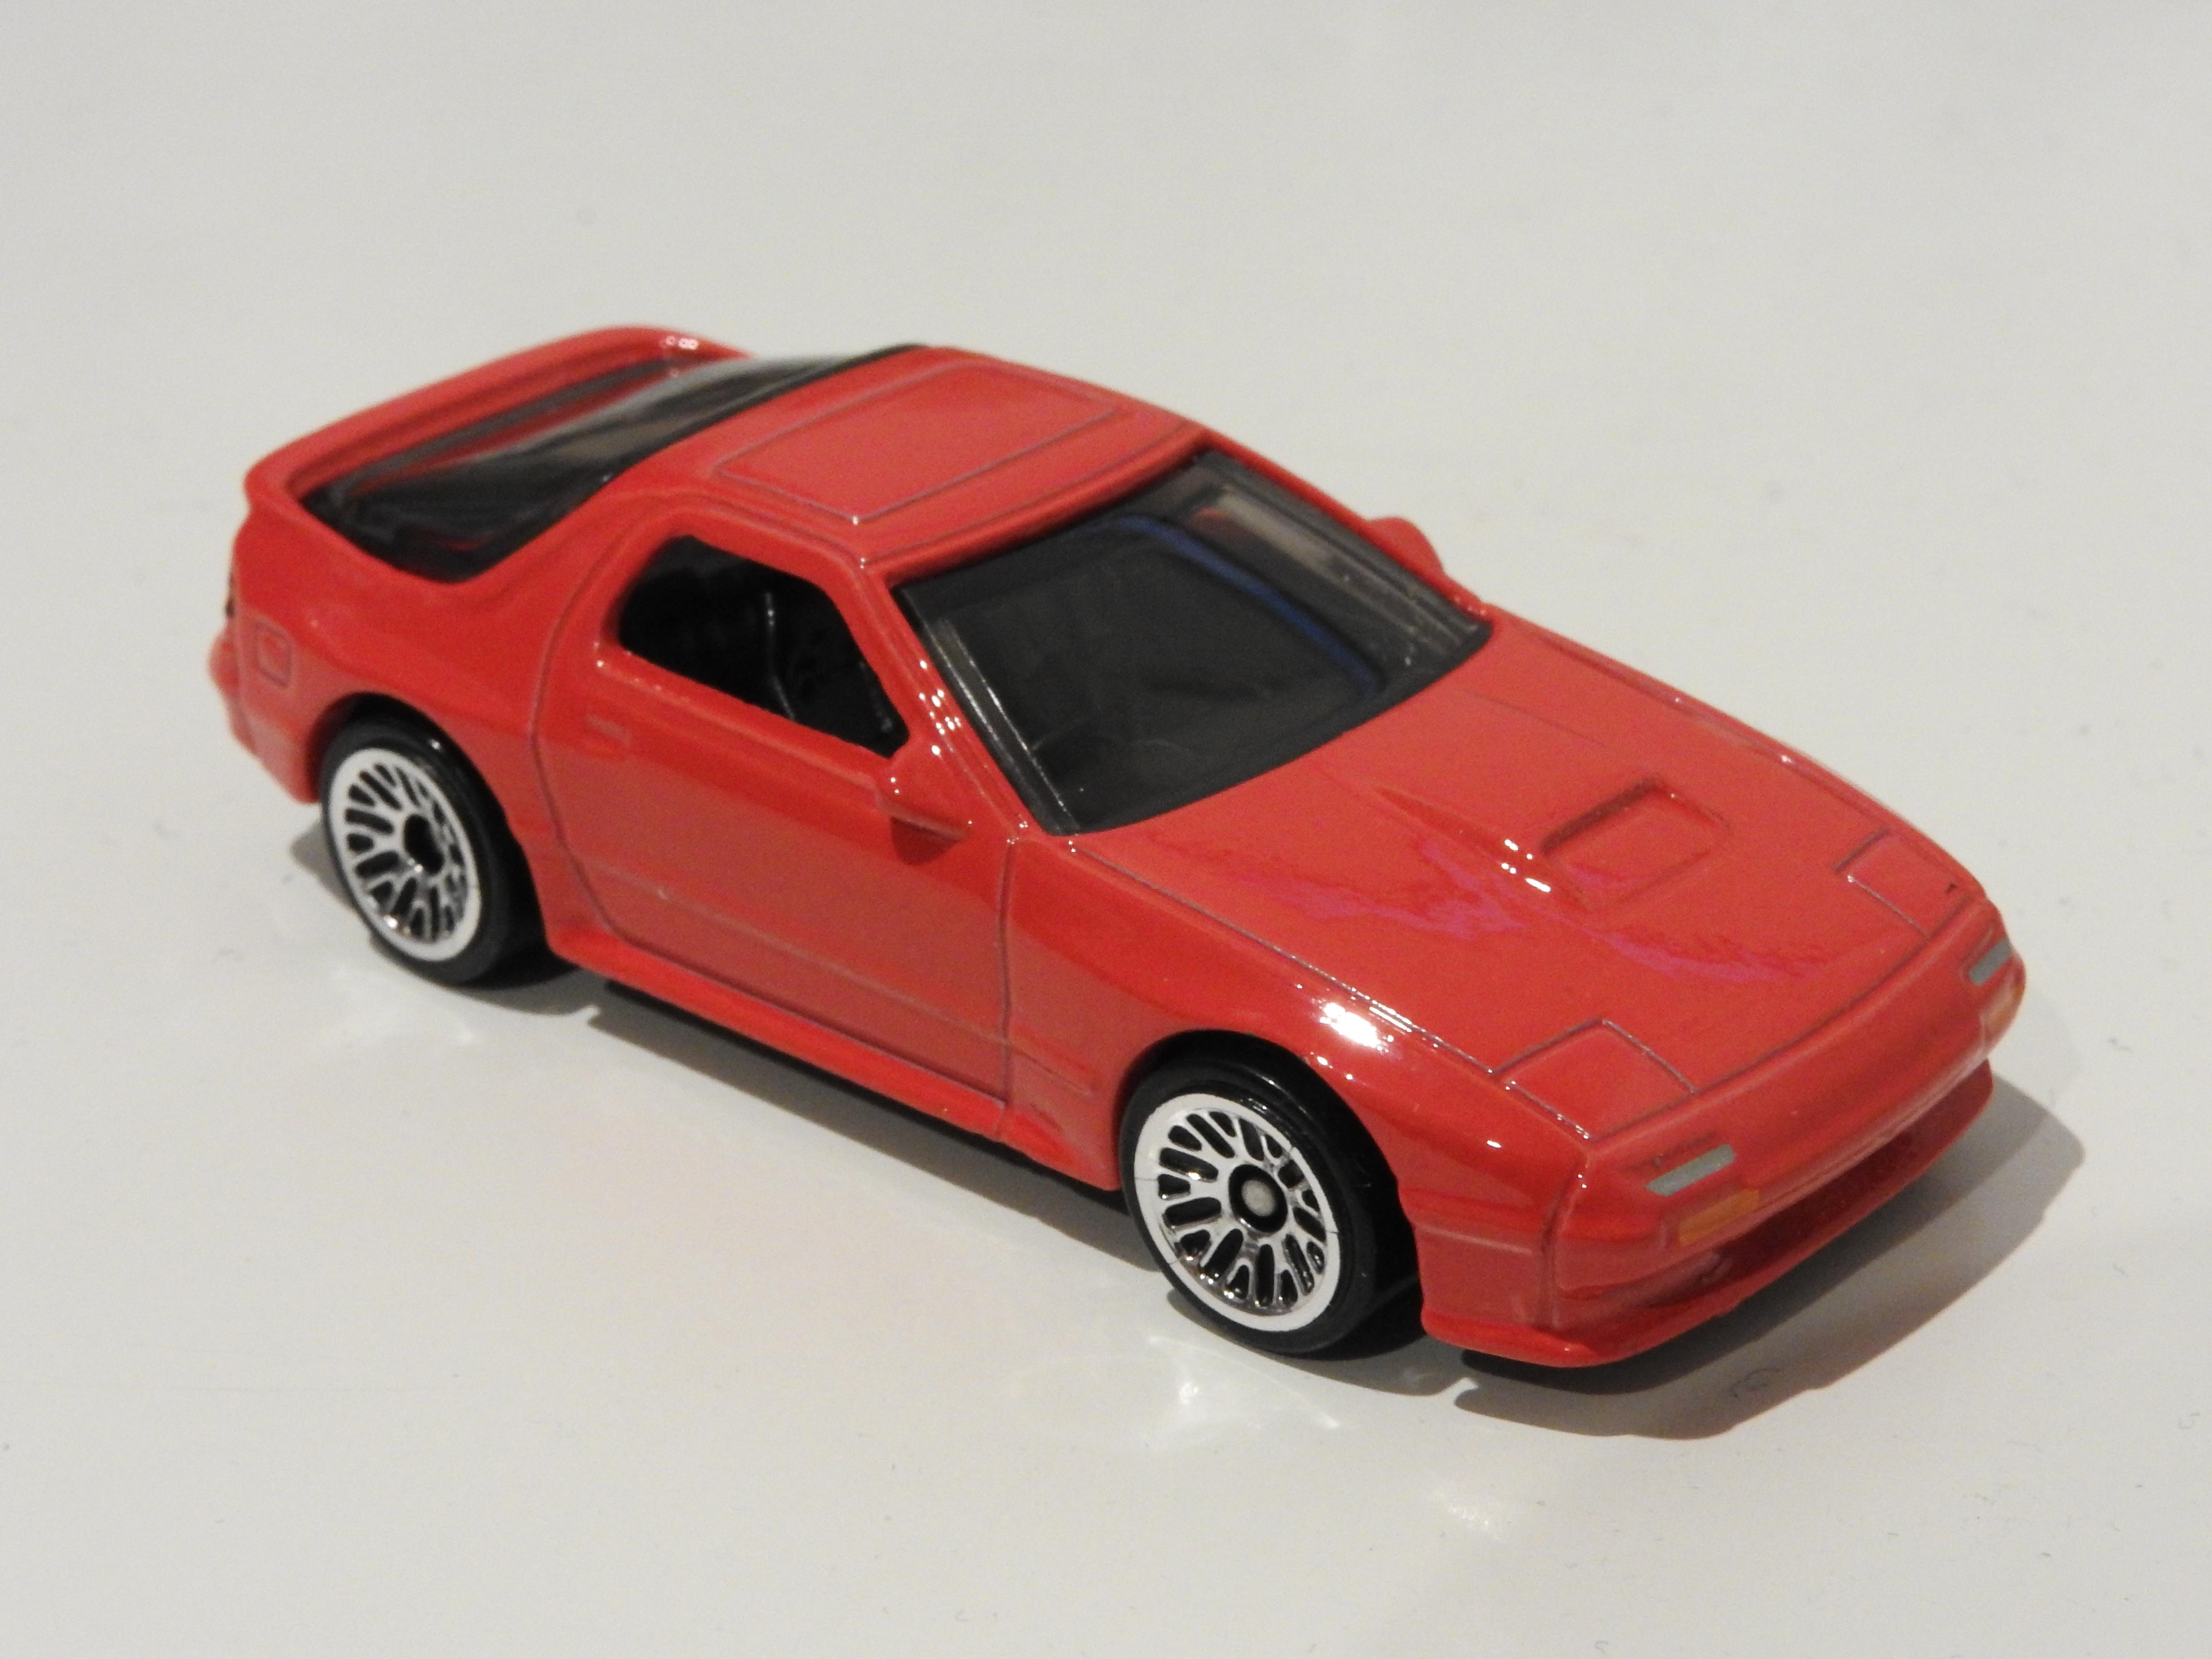 '89 Mazda Savanna RX-7 FC3S